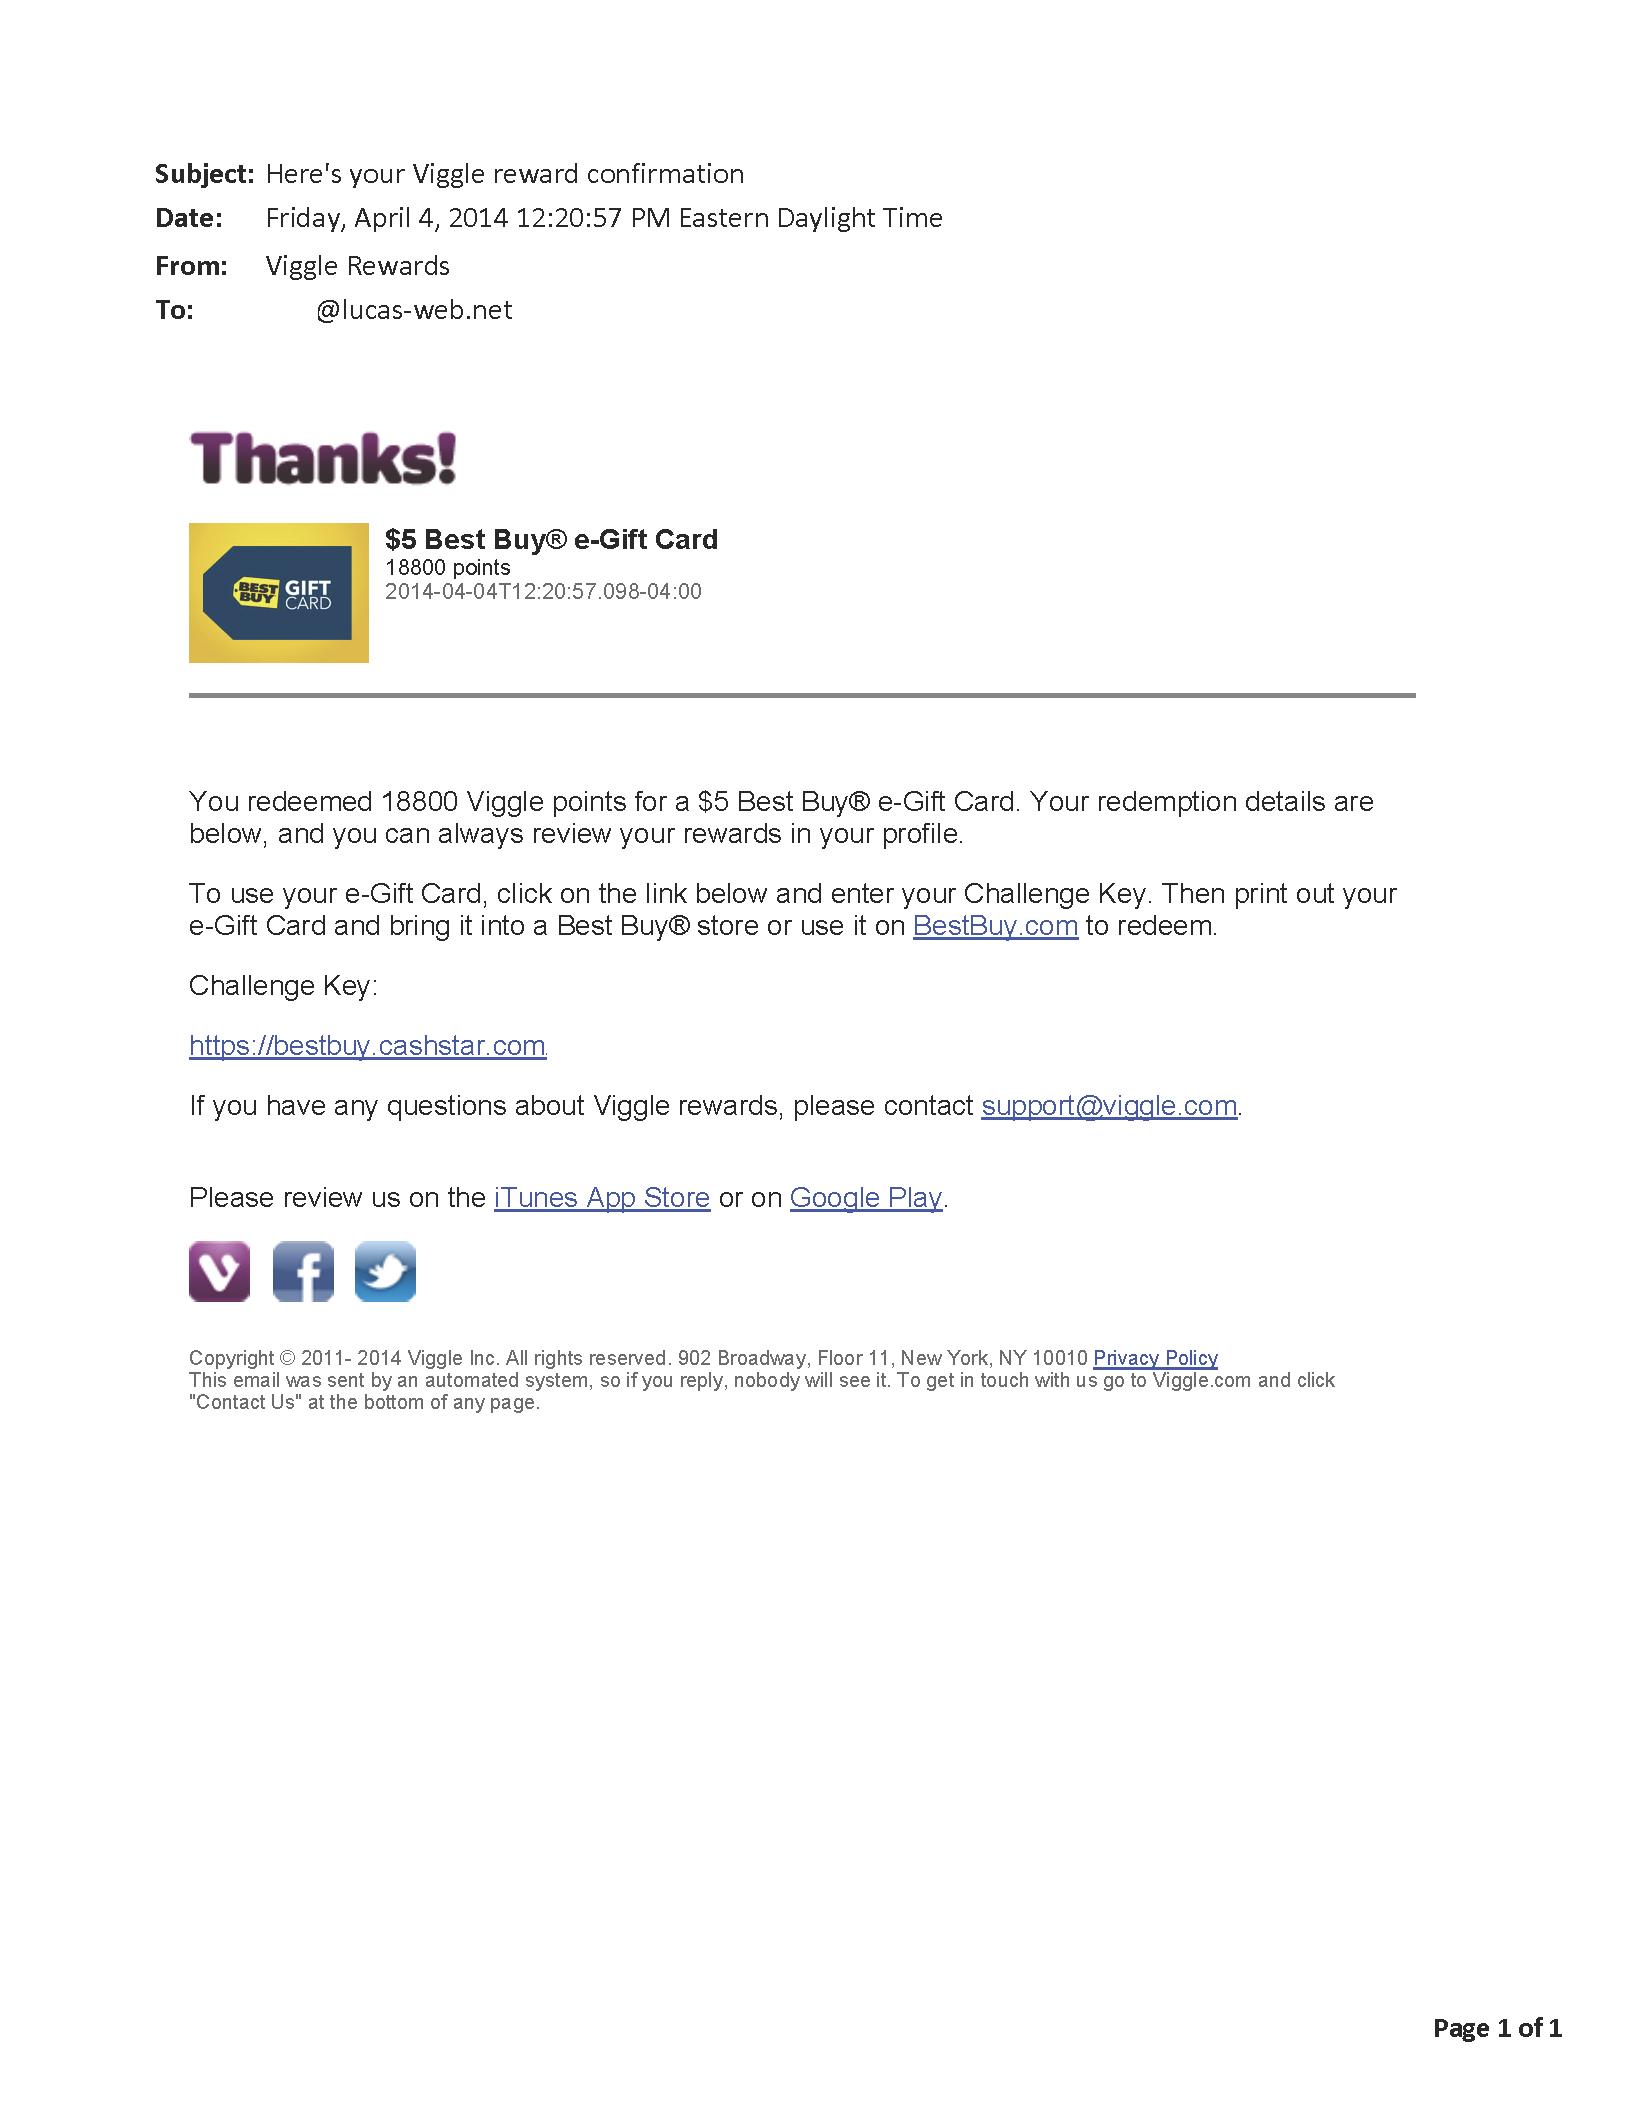 $5.00 - Viggle - April 4, 2014